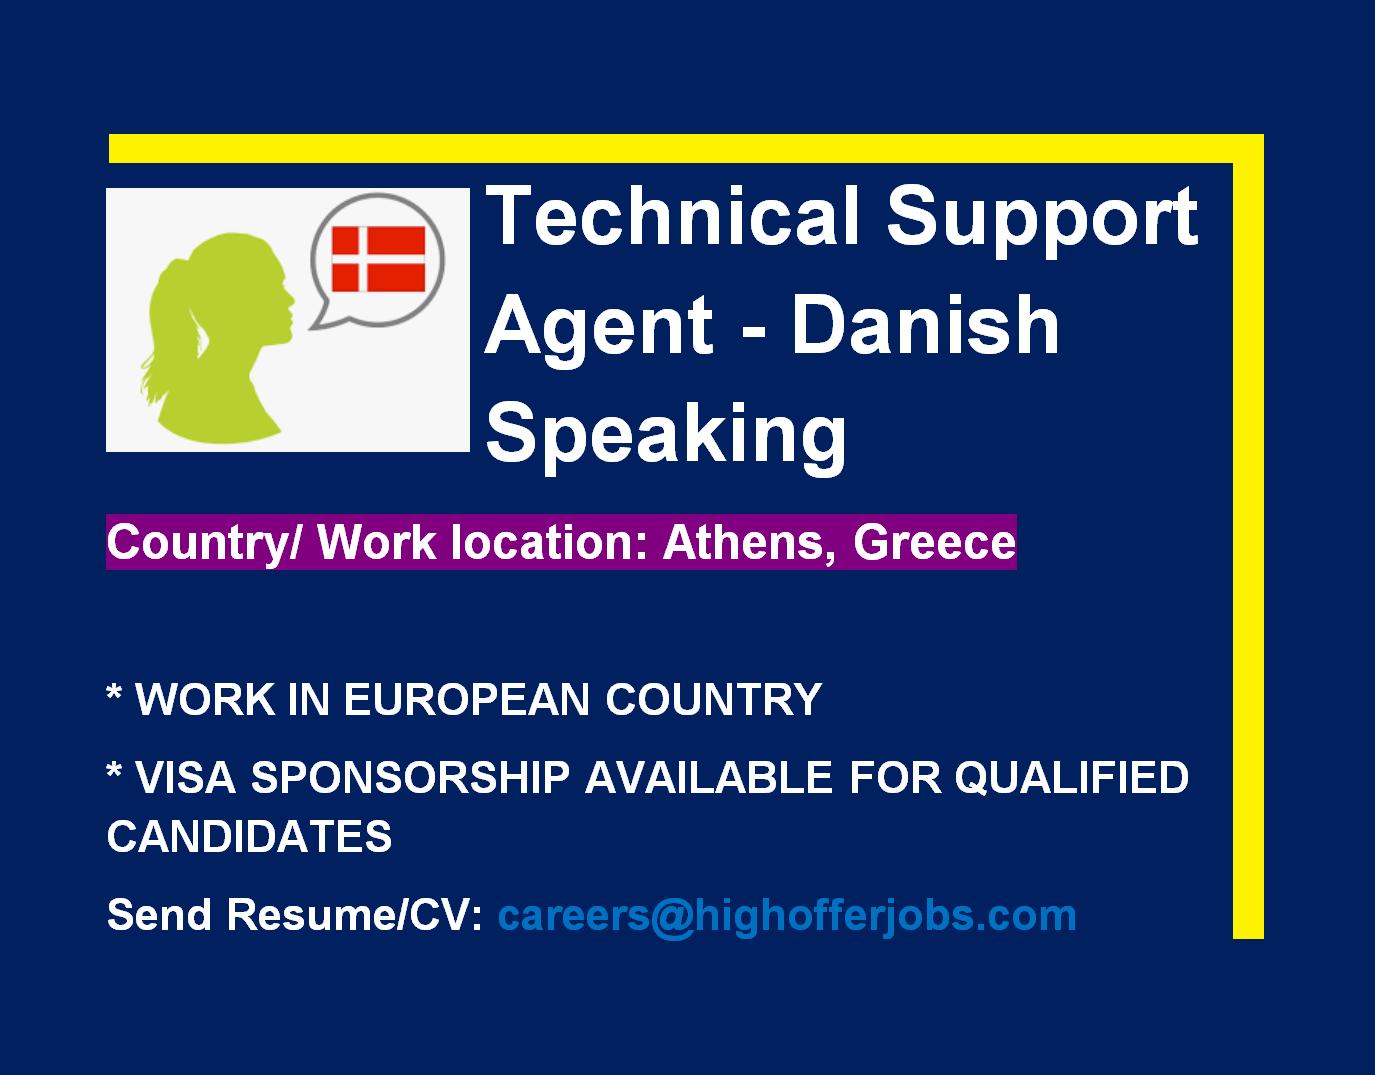 Danish Speaking Technical Support